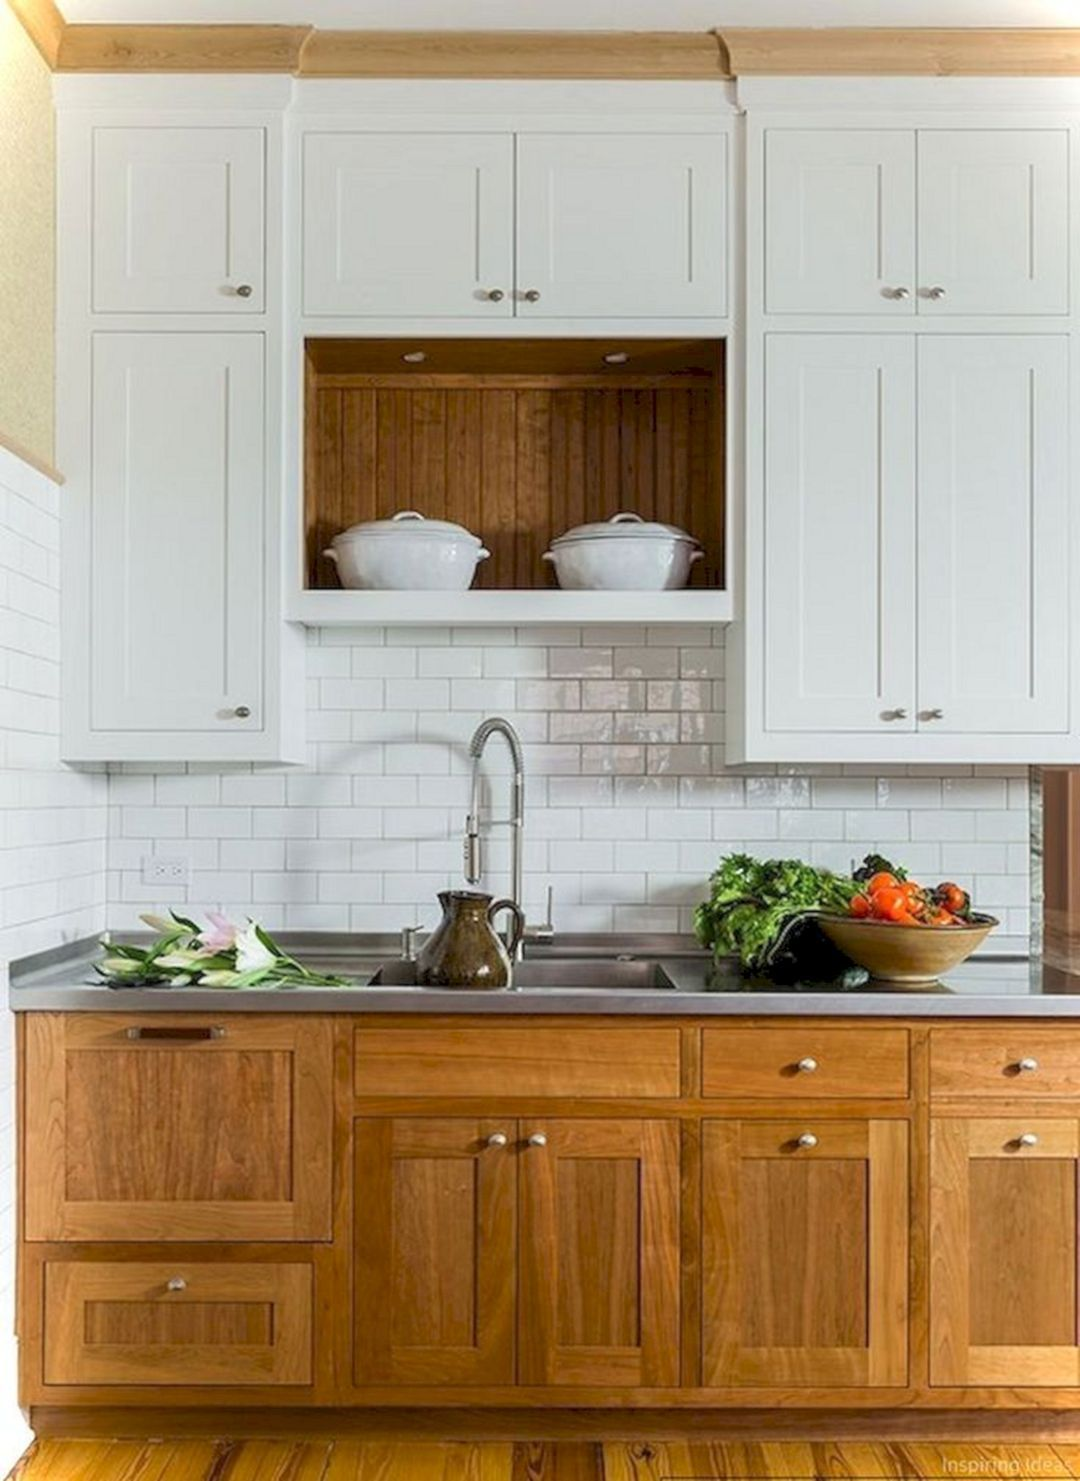 marvellous modern industrial kitchen ideas | 10+ Marvelous Modern Farmhouse Kitchen Cabinet That ...